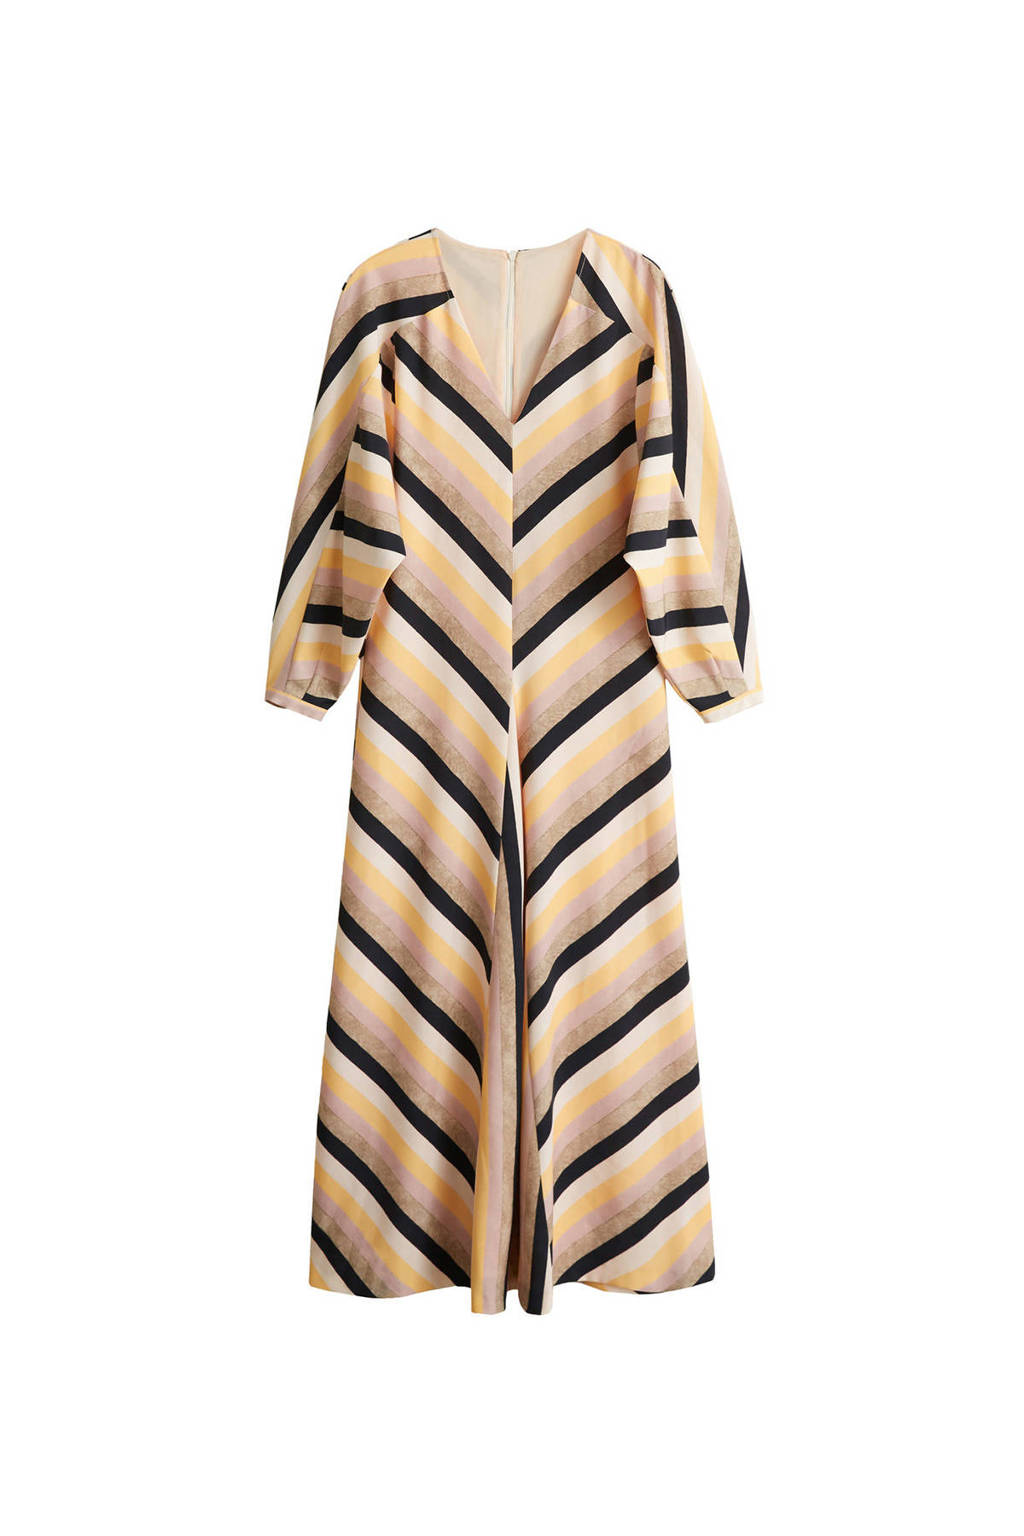 Mango jurk met streep print pastel roze, Pastel roze/ Zwart/ Ecru/ Beige/ Geel